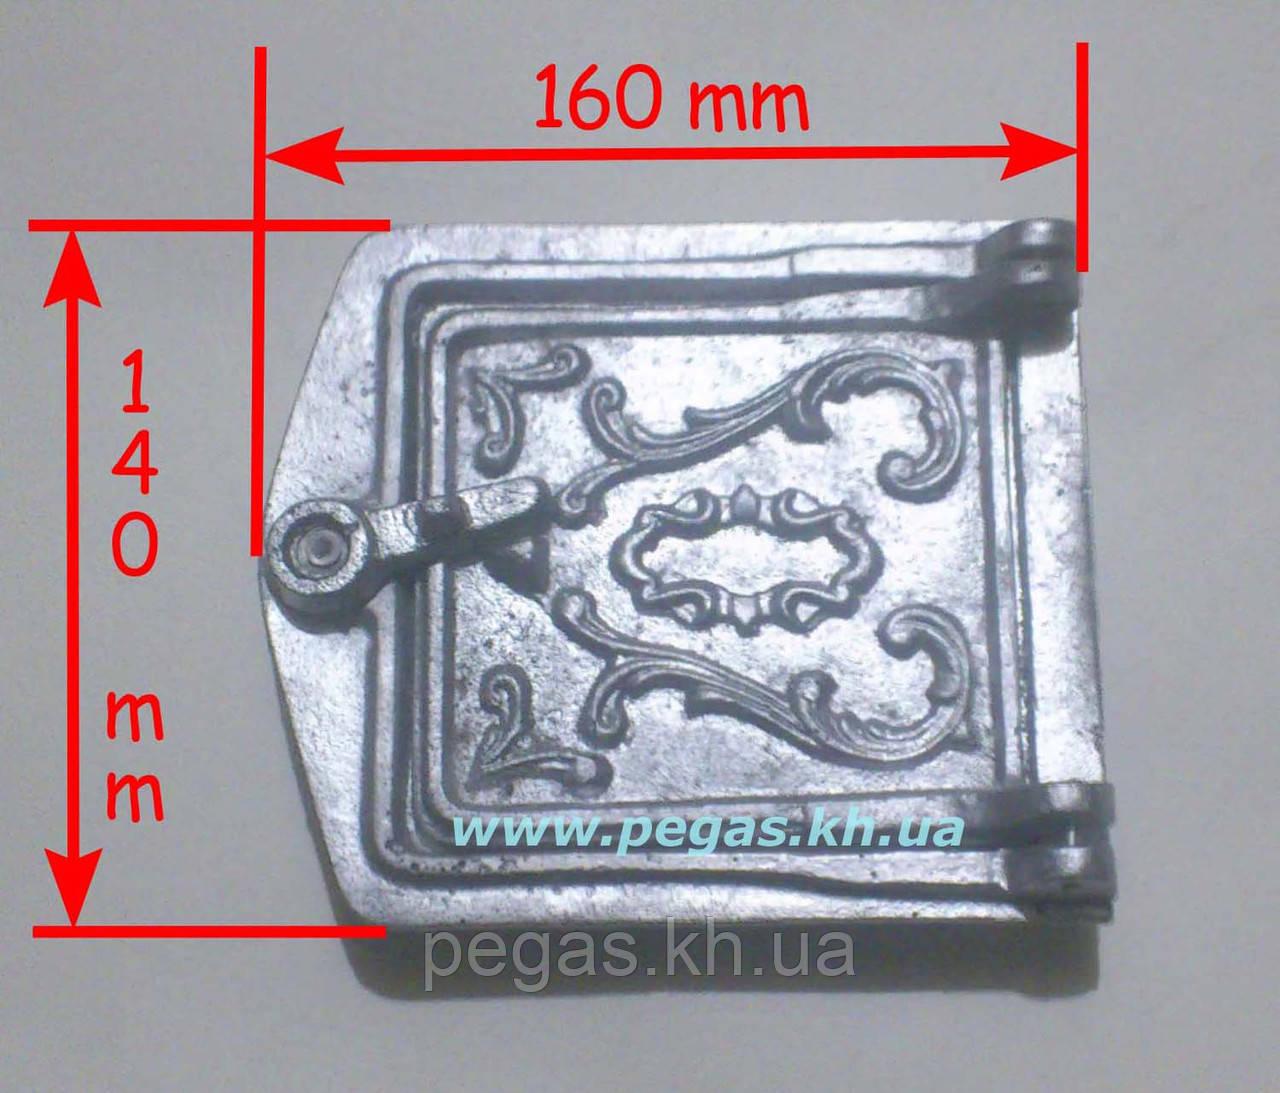 Сажетруска печная алюминиевая (110х115 мм) печи, грубу, мангал, барбекю